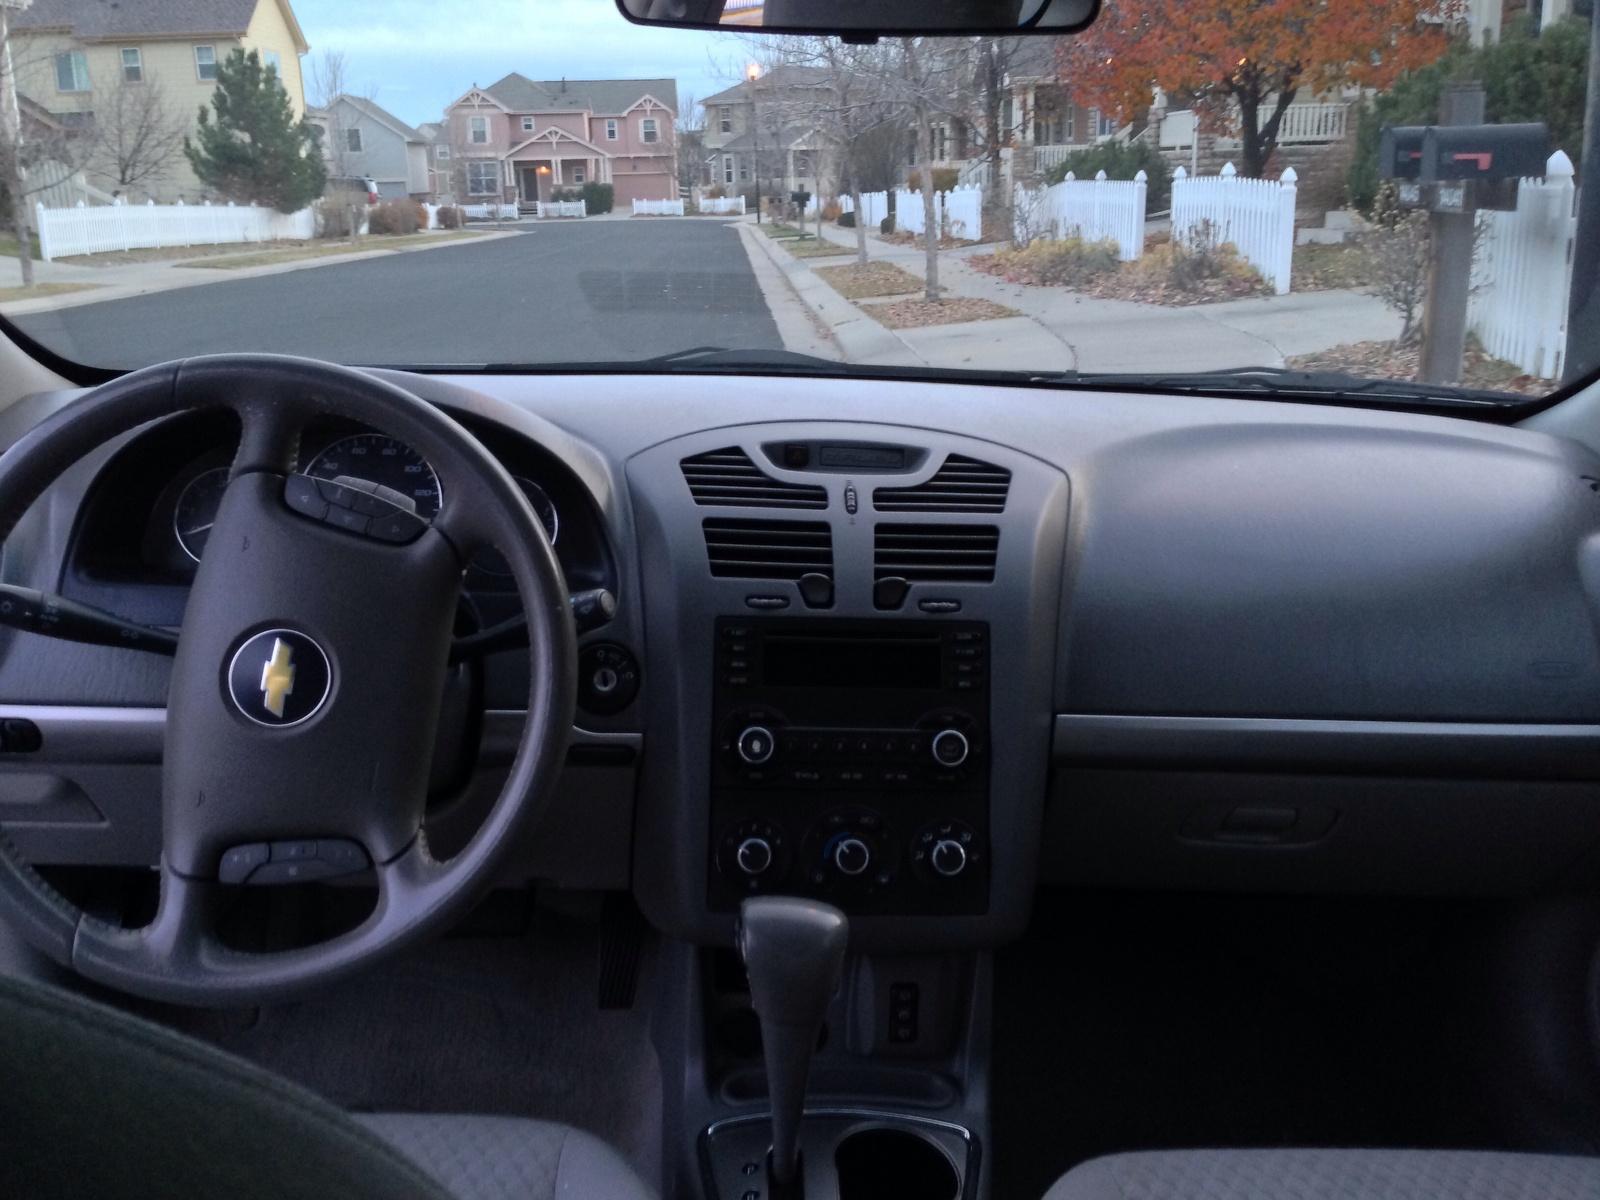 2006 Chevrolet Silverado 1500 Ss Reviews >> 2006 Chevrolet Malibu Maxx - Pictures - CarGurus